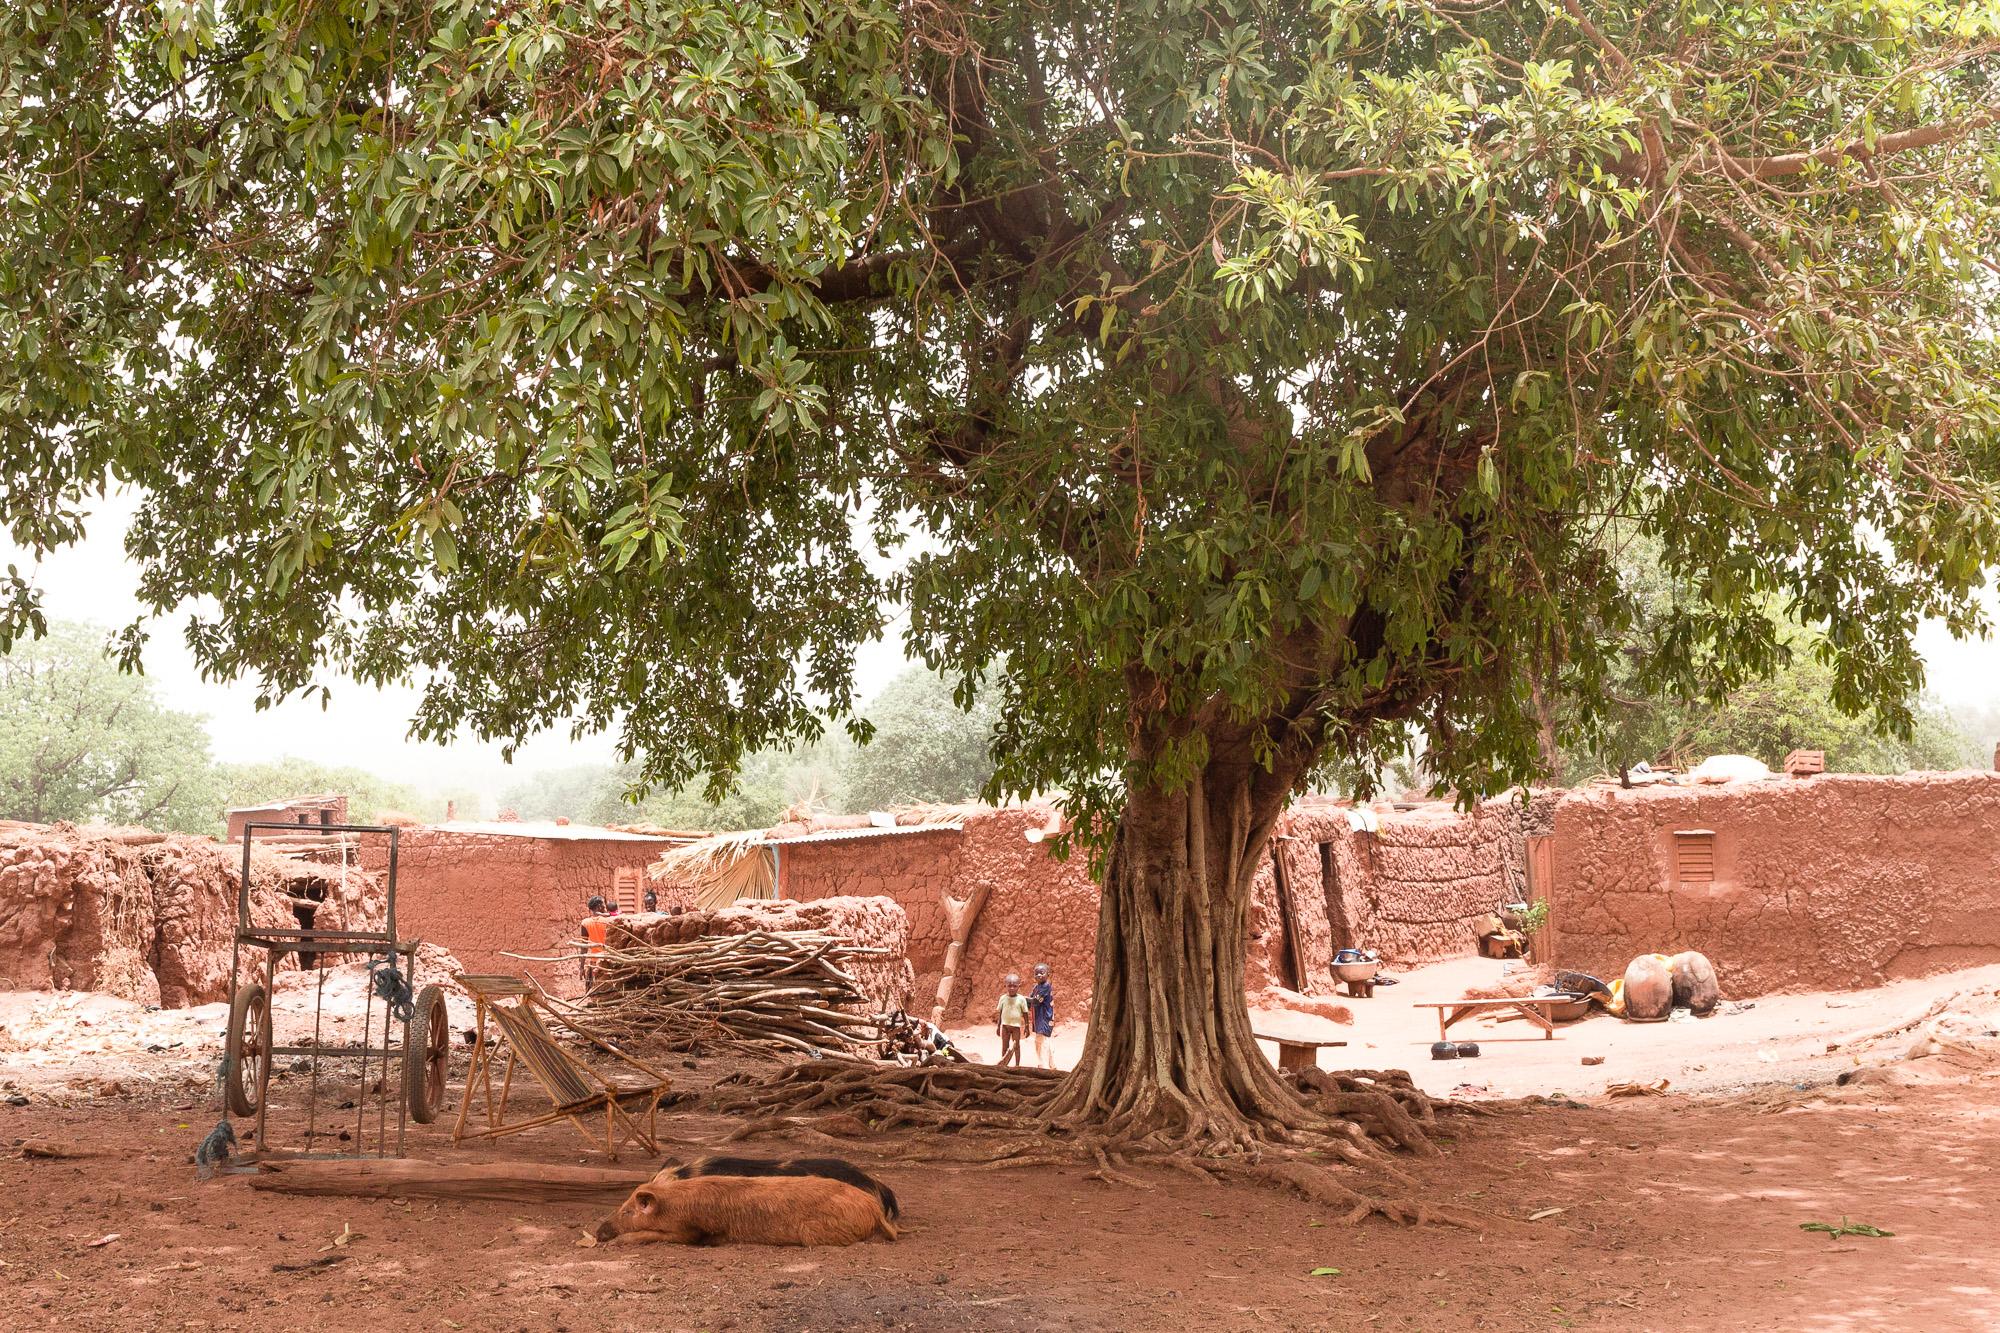 ficus dans le village traditionnel Bobo de Koumi, Burkina Faso